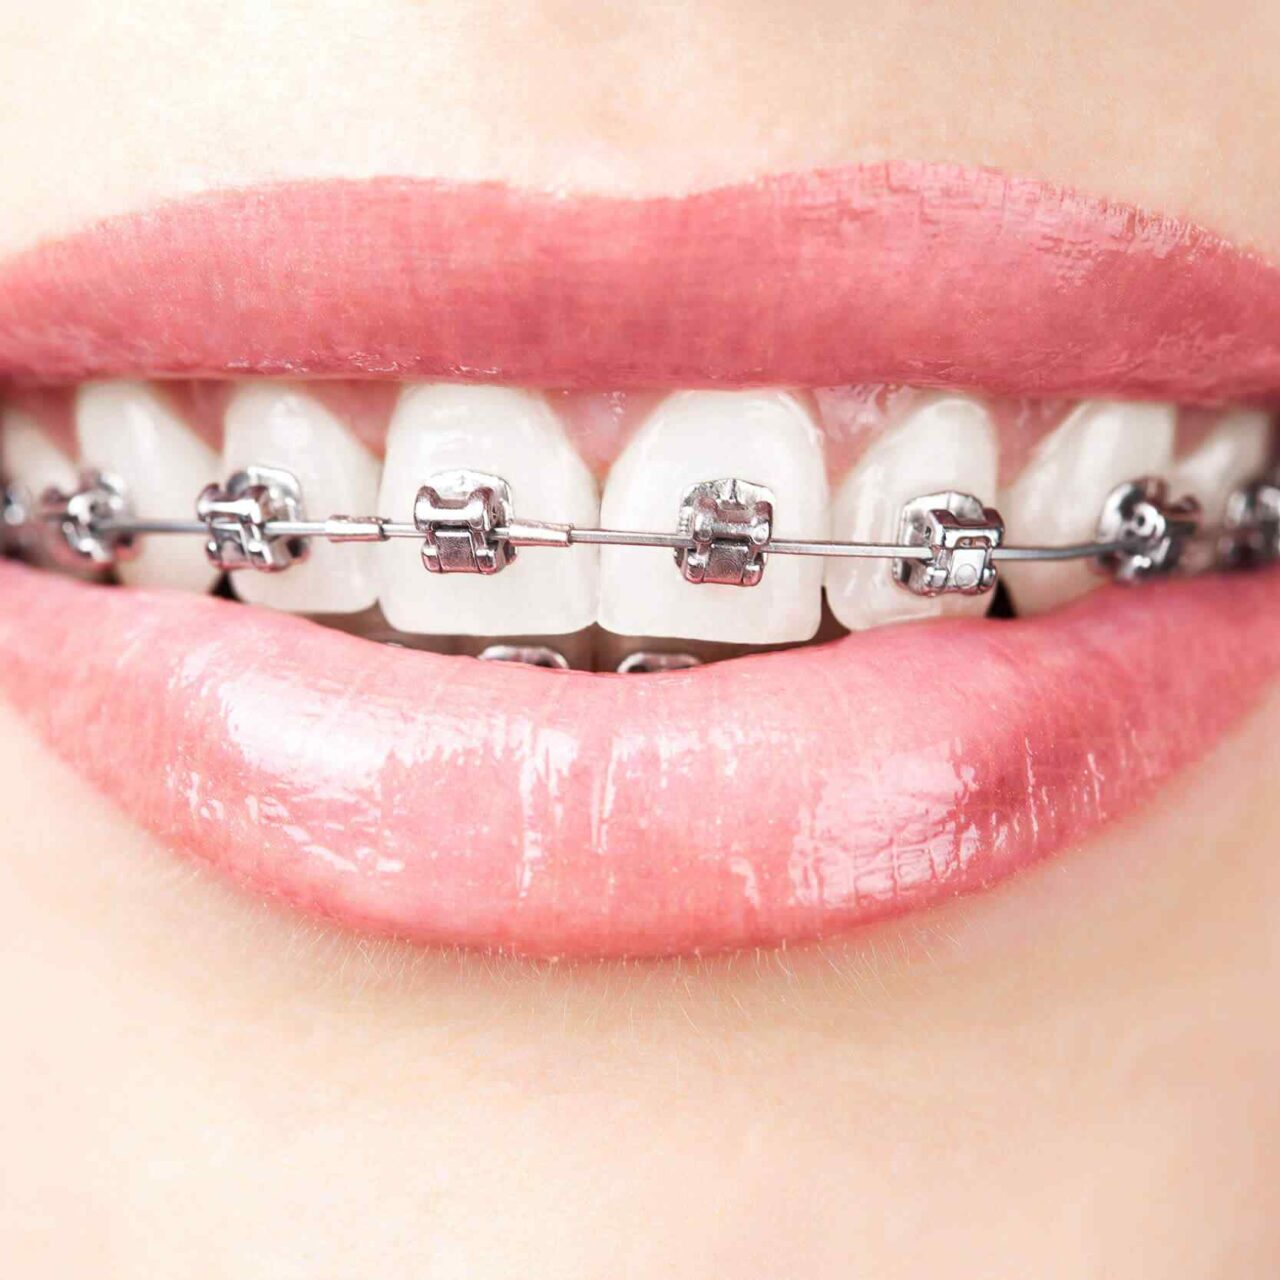 https://medentinadigital.rs/wp-content/uploads/2021/05/ortodoncija.jpg